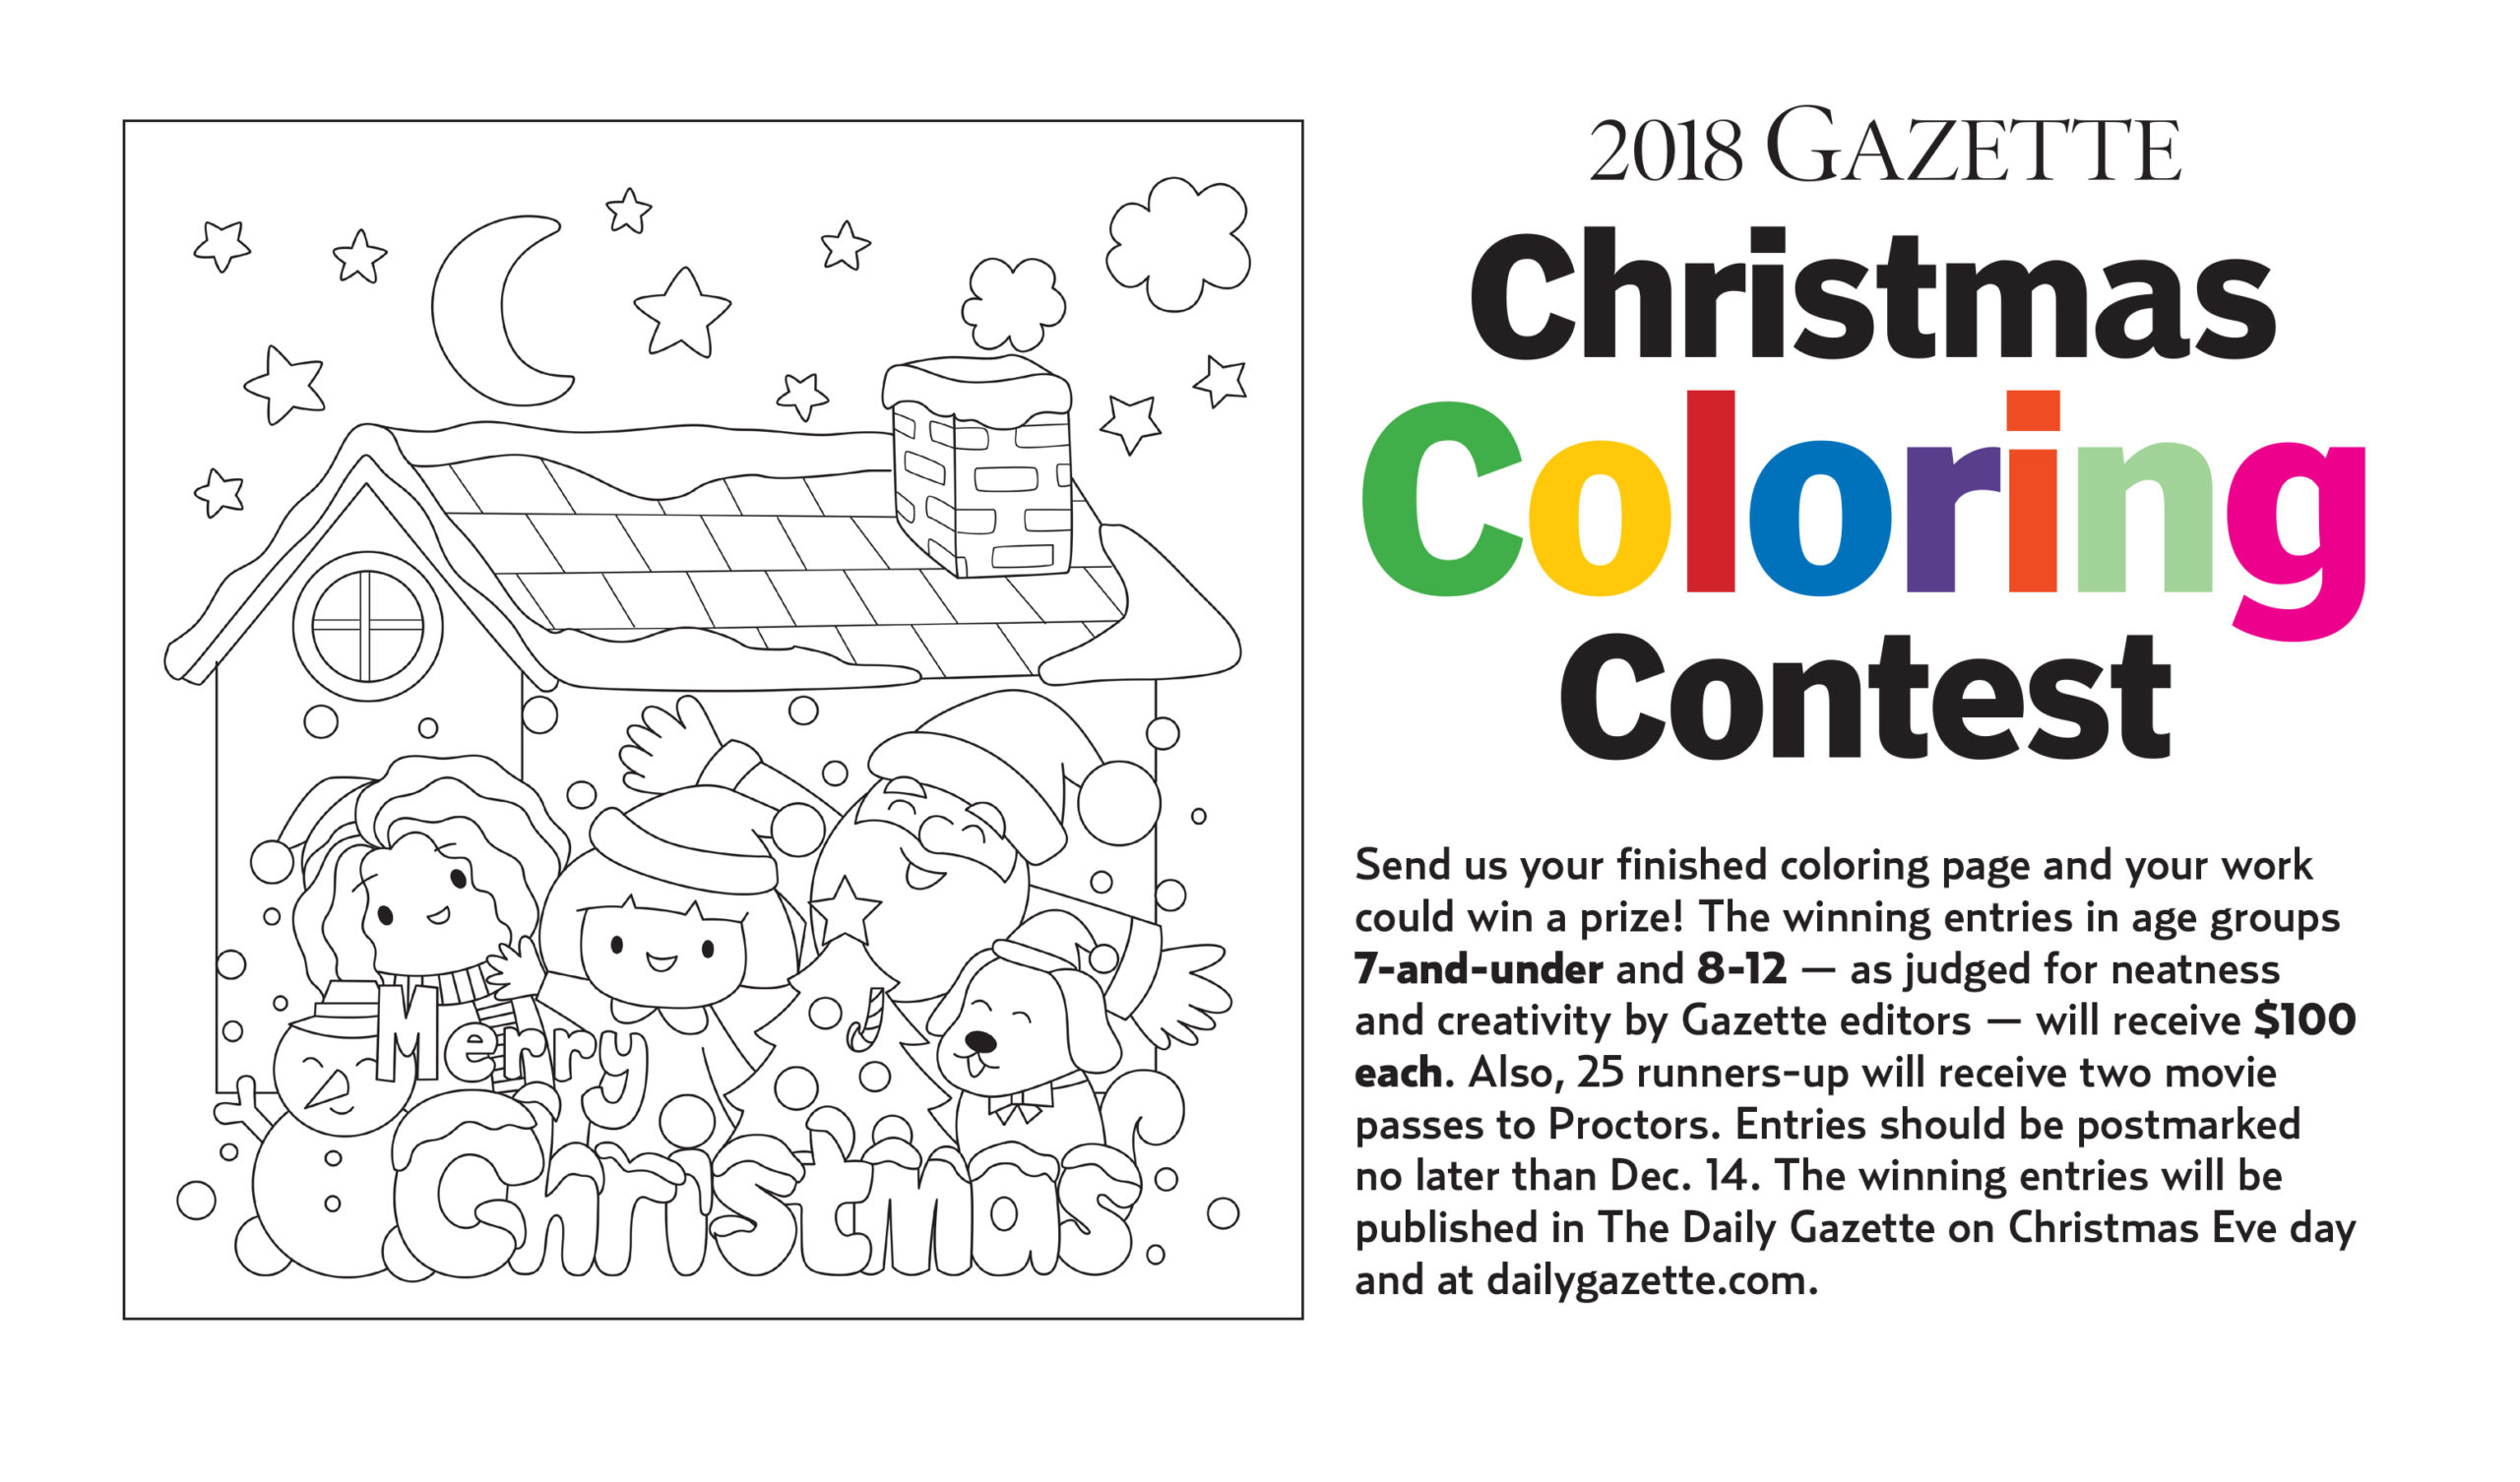 gazette christmas coloring contest under way the daily gazette the daily gazette